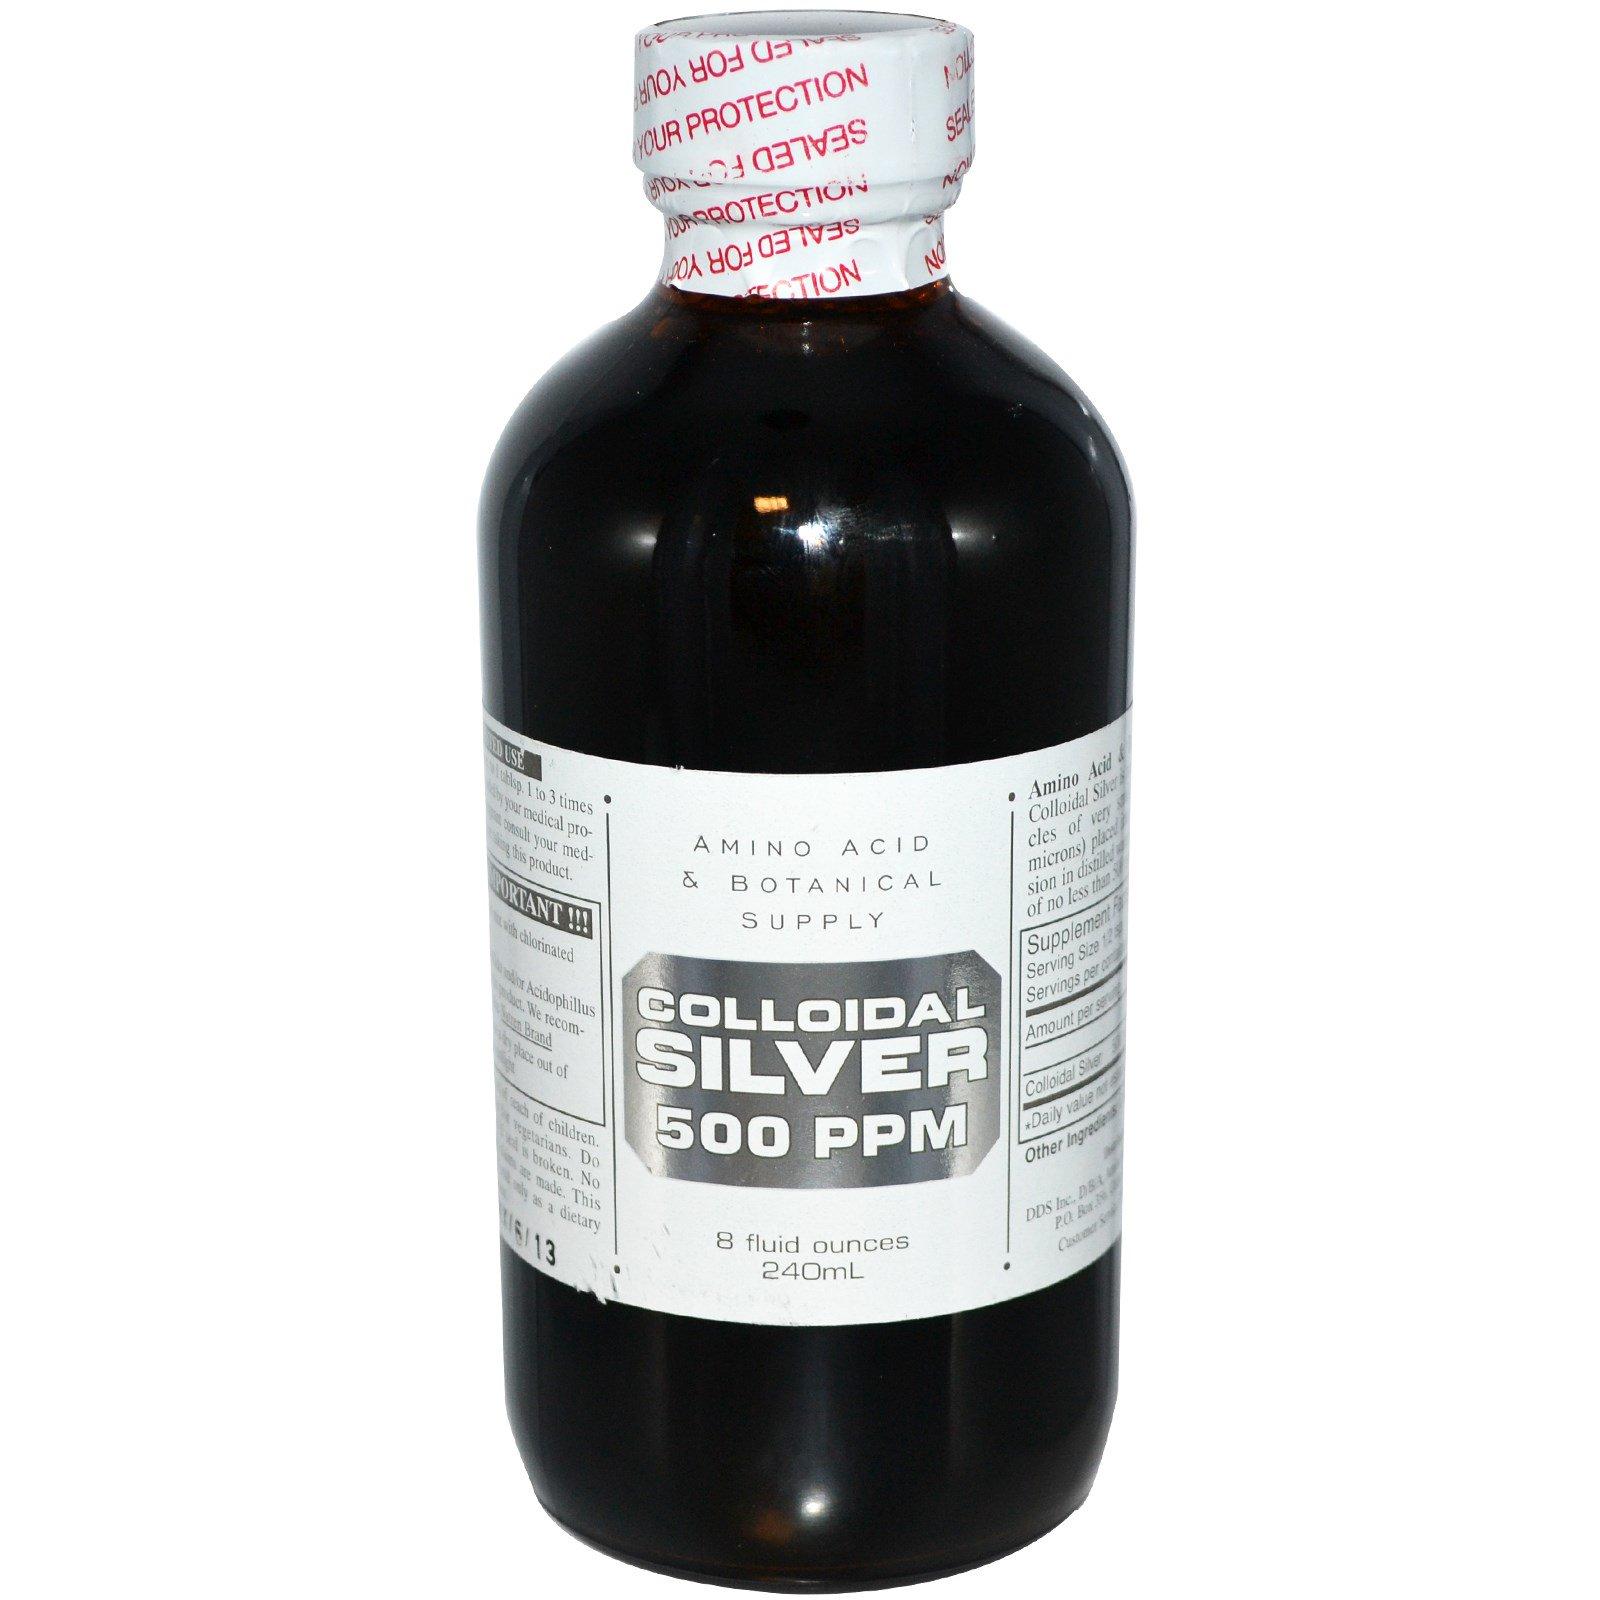 Amino Acid & Botanical Supply, Коллоидное серебро, 500 ч/млн, 8 жидк. унц. (240 мл)